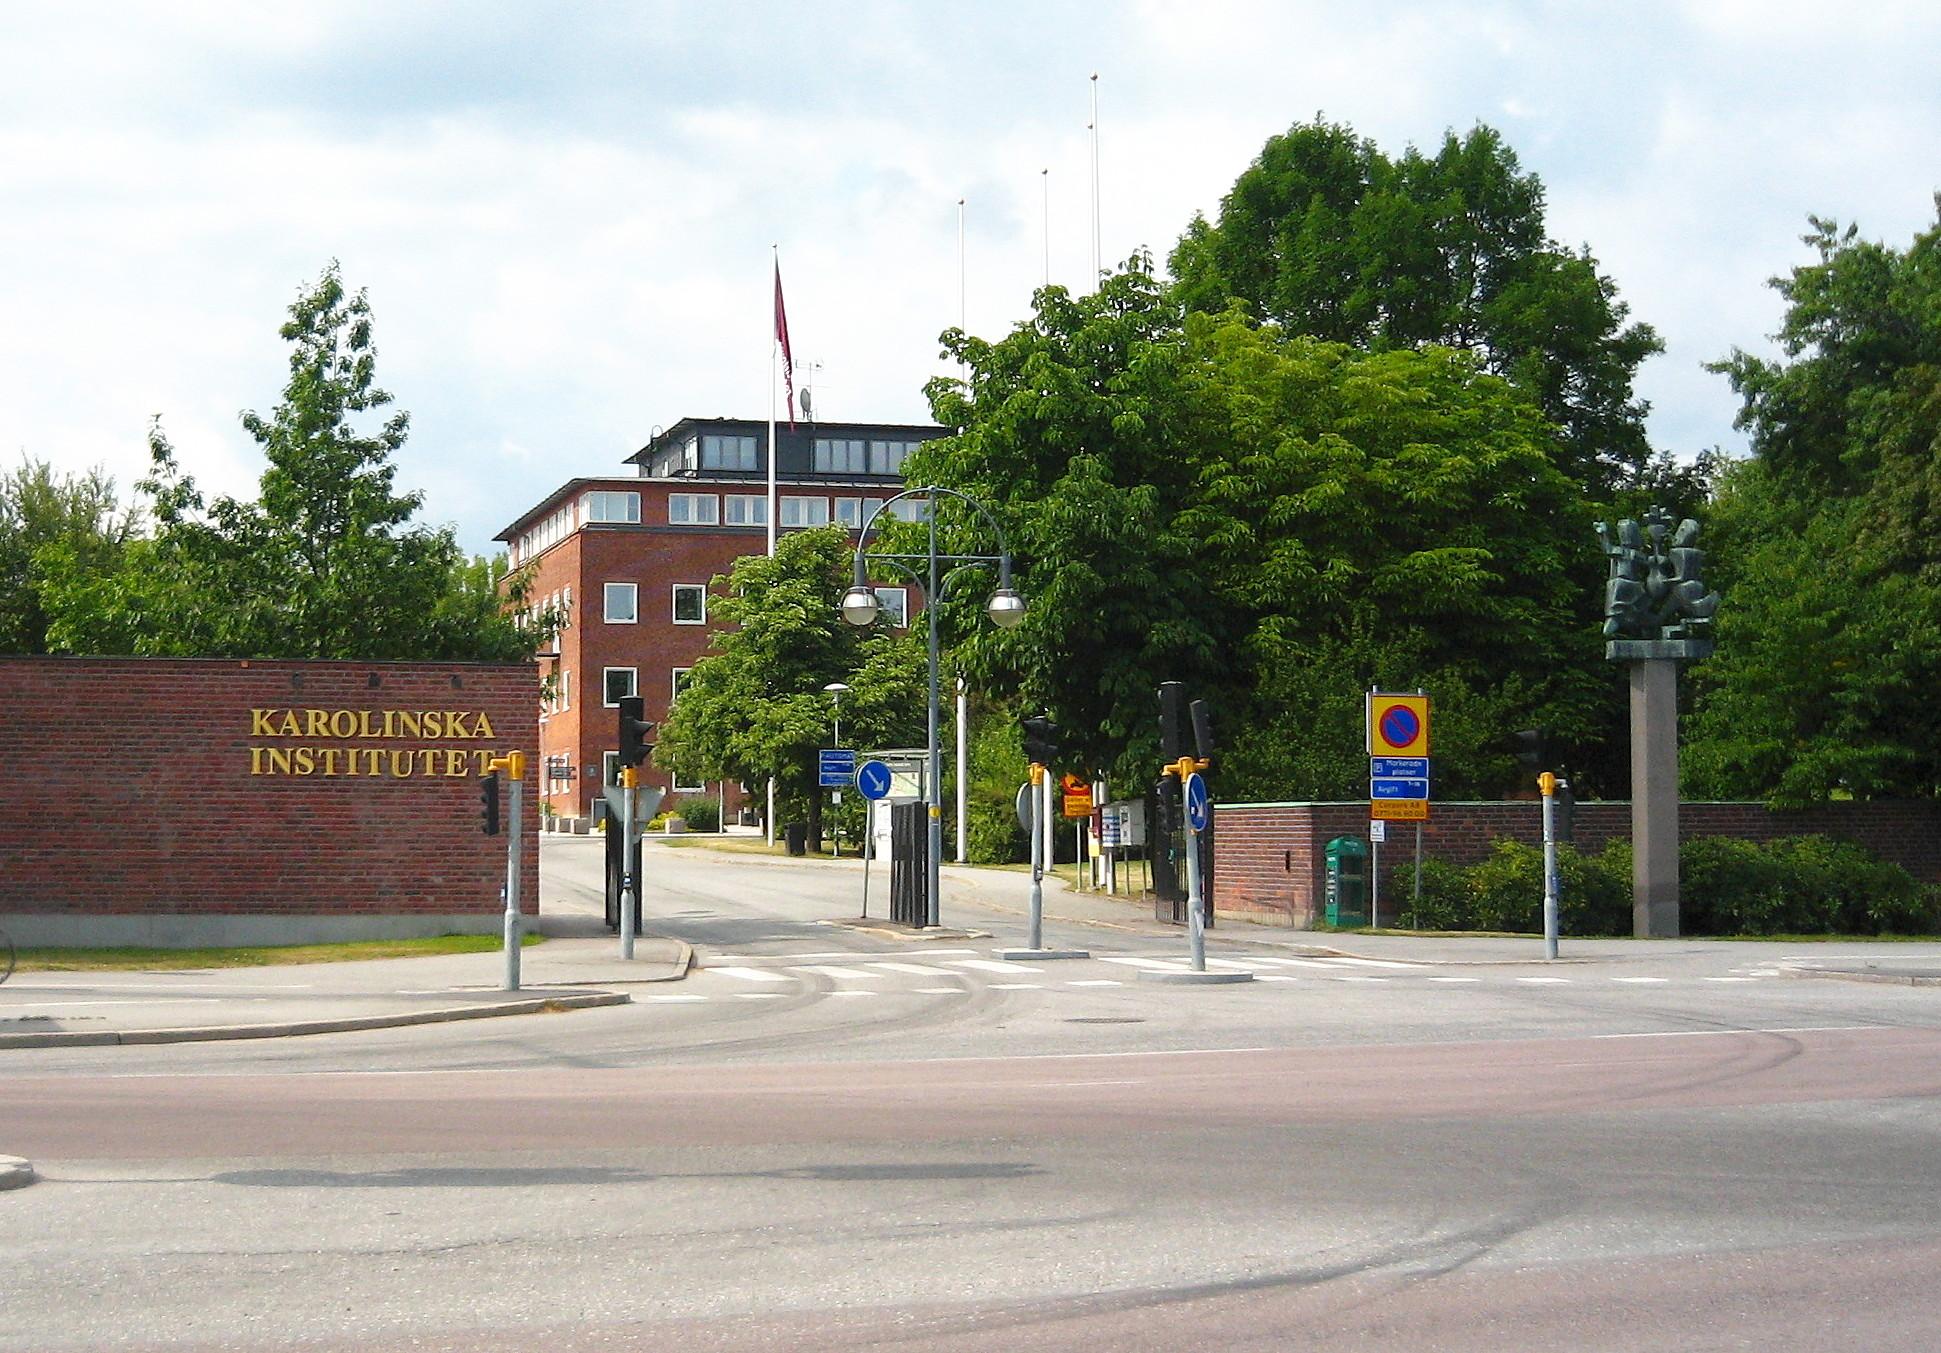 image of Karolinska Institute